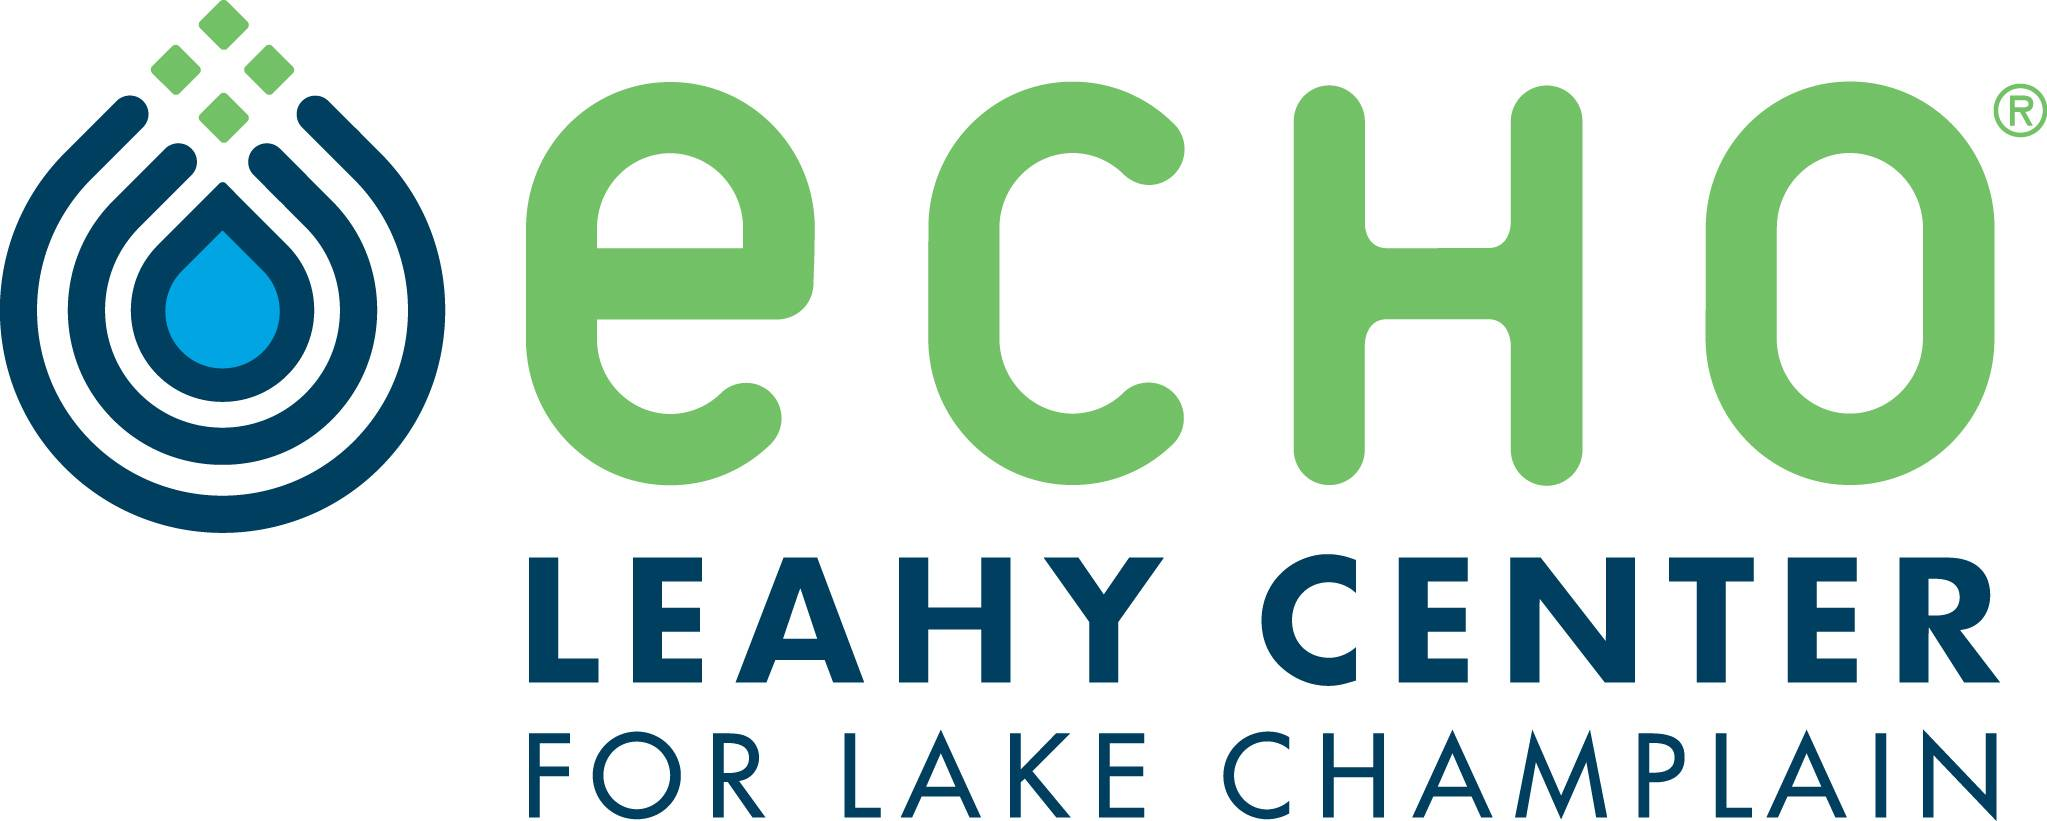 Logo of ECHO, Leahy Center for Lake Champlain